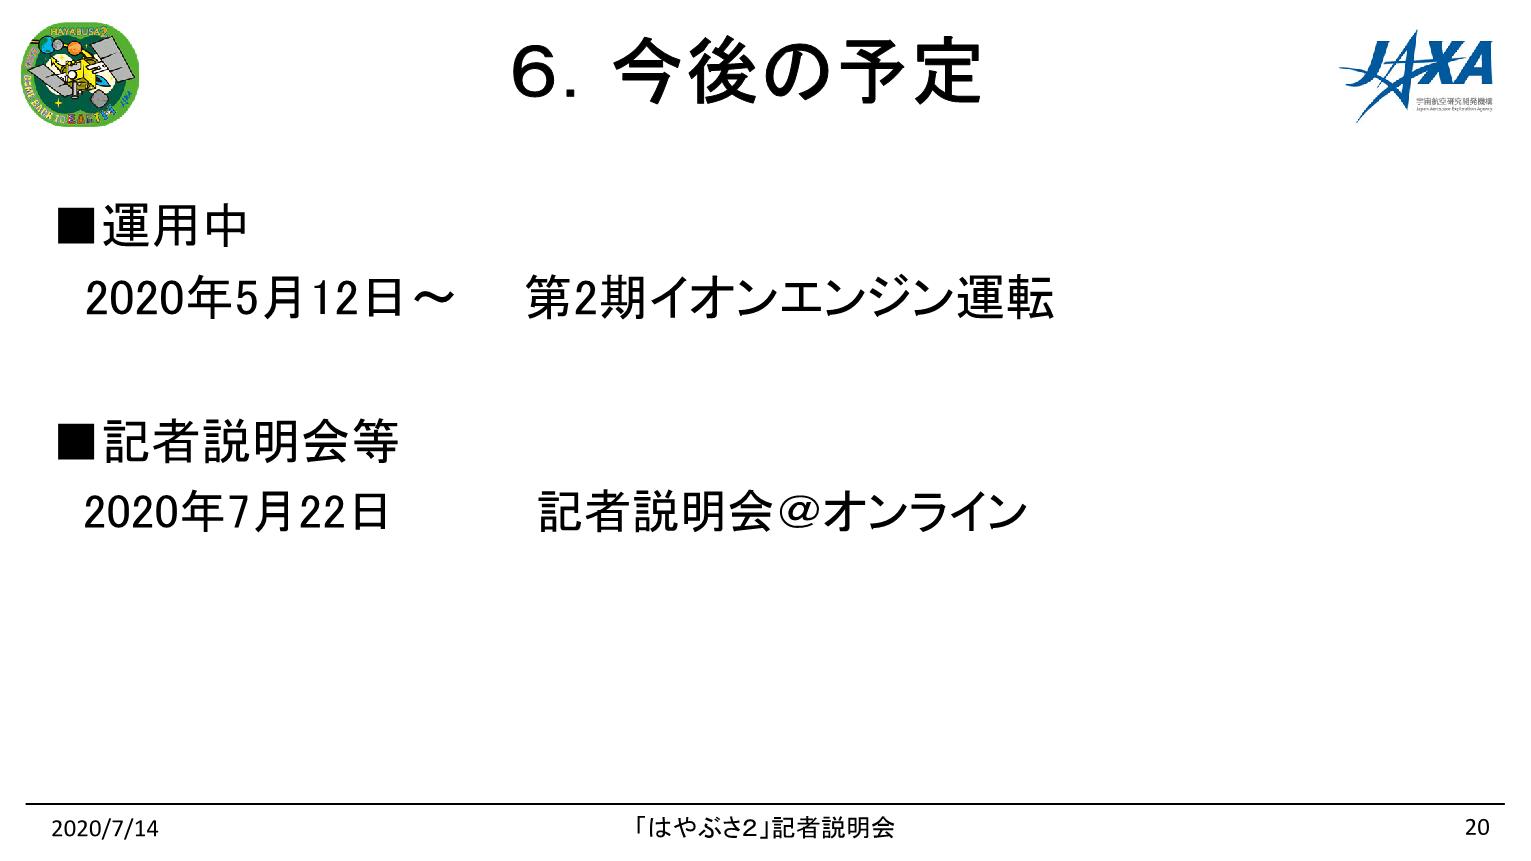 f:id:Imamura:20200714230357p:plain